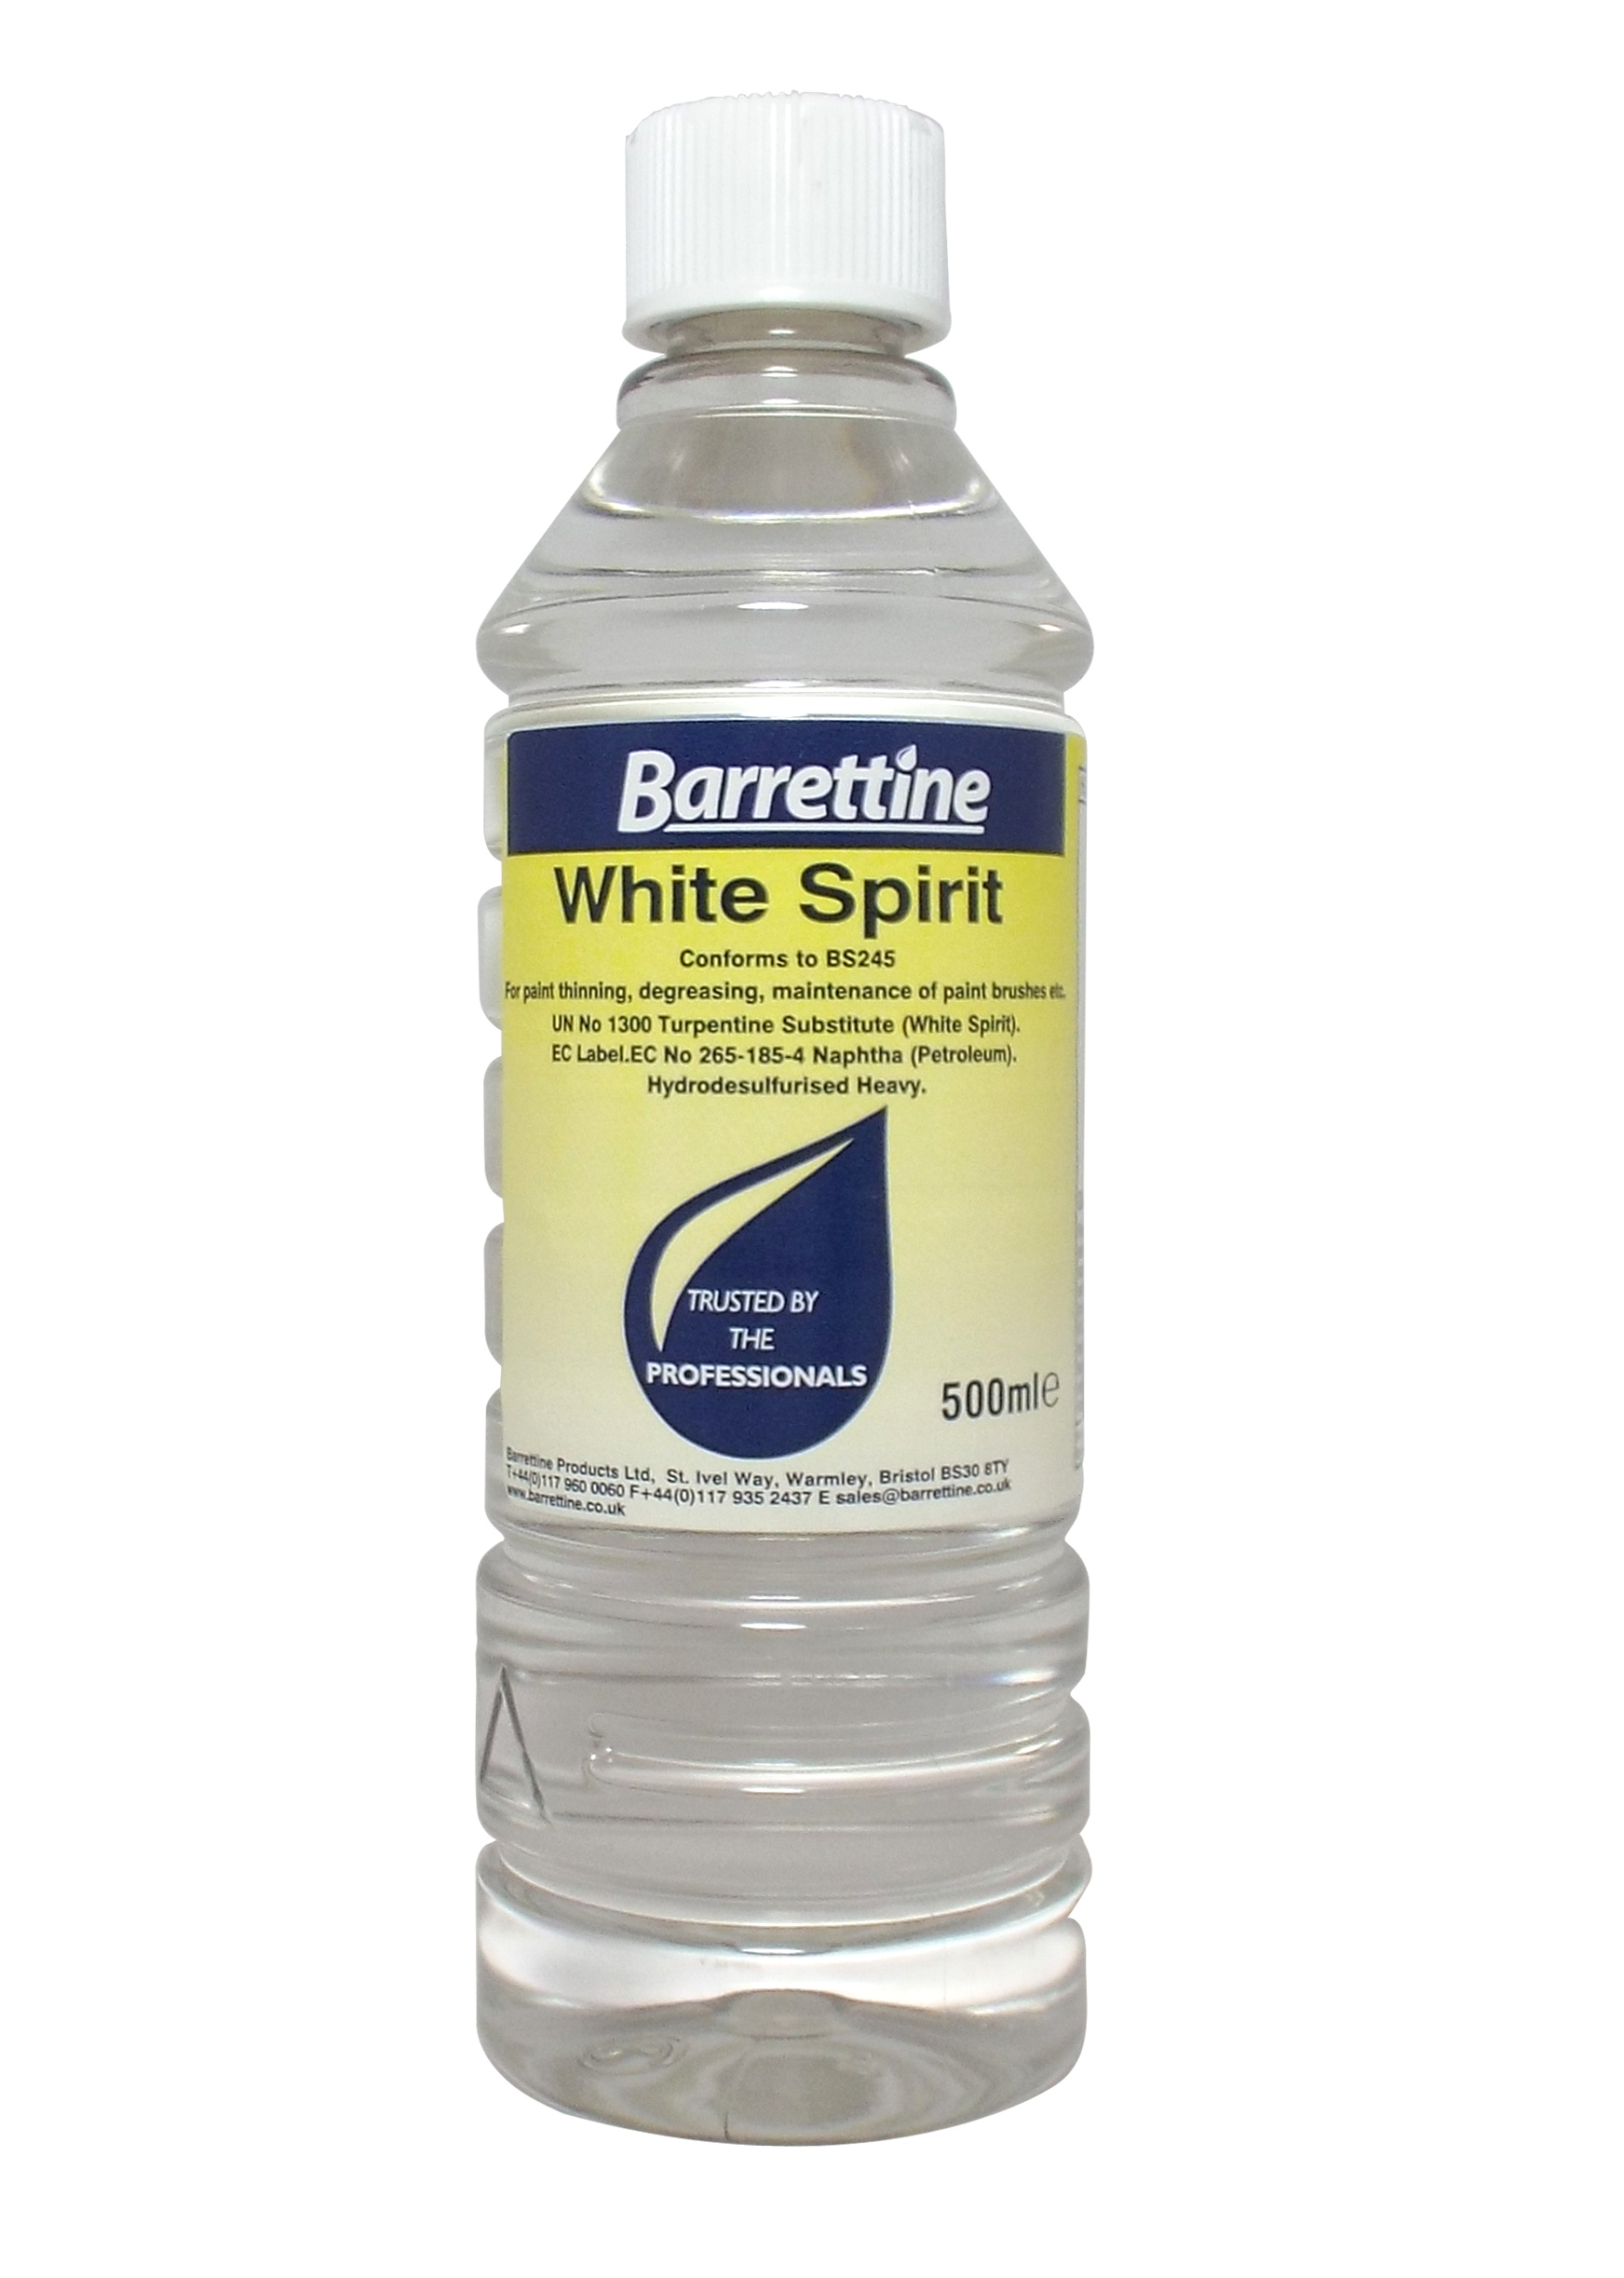 White Spirit Barrettine Products